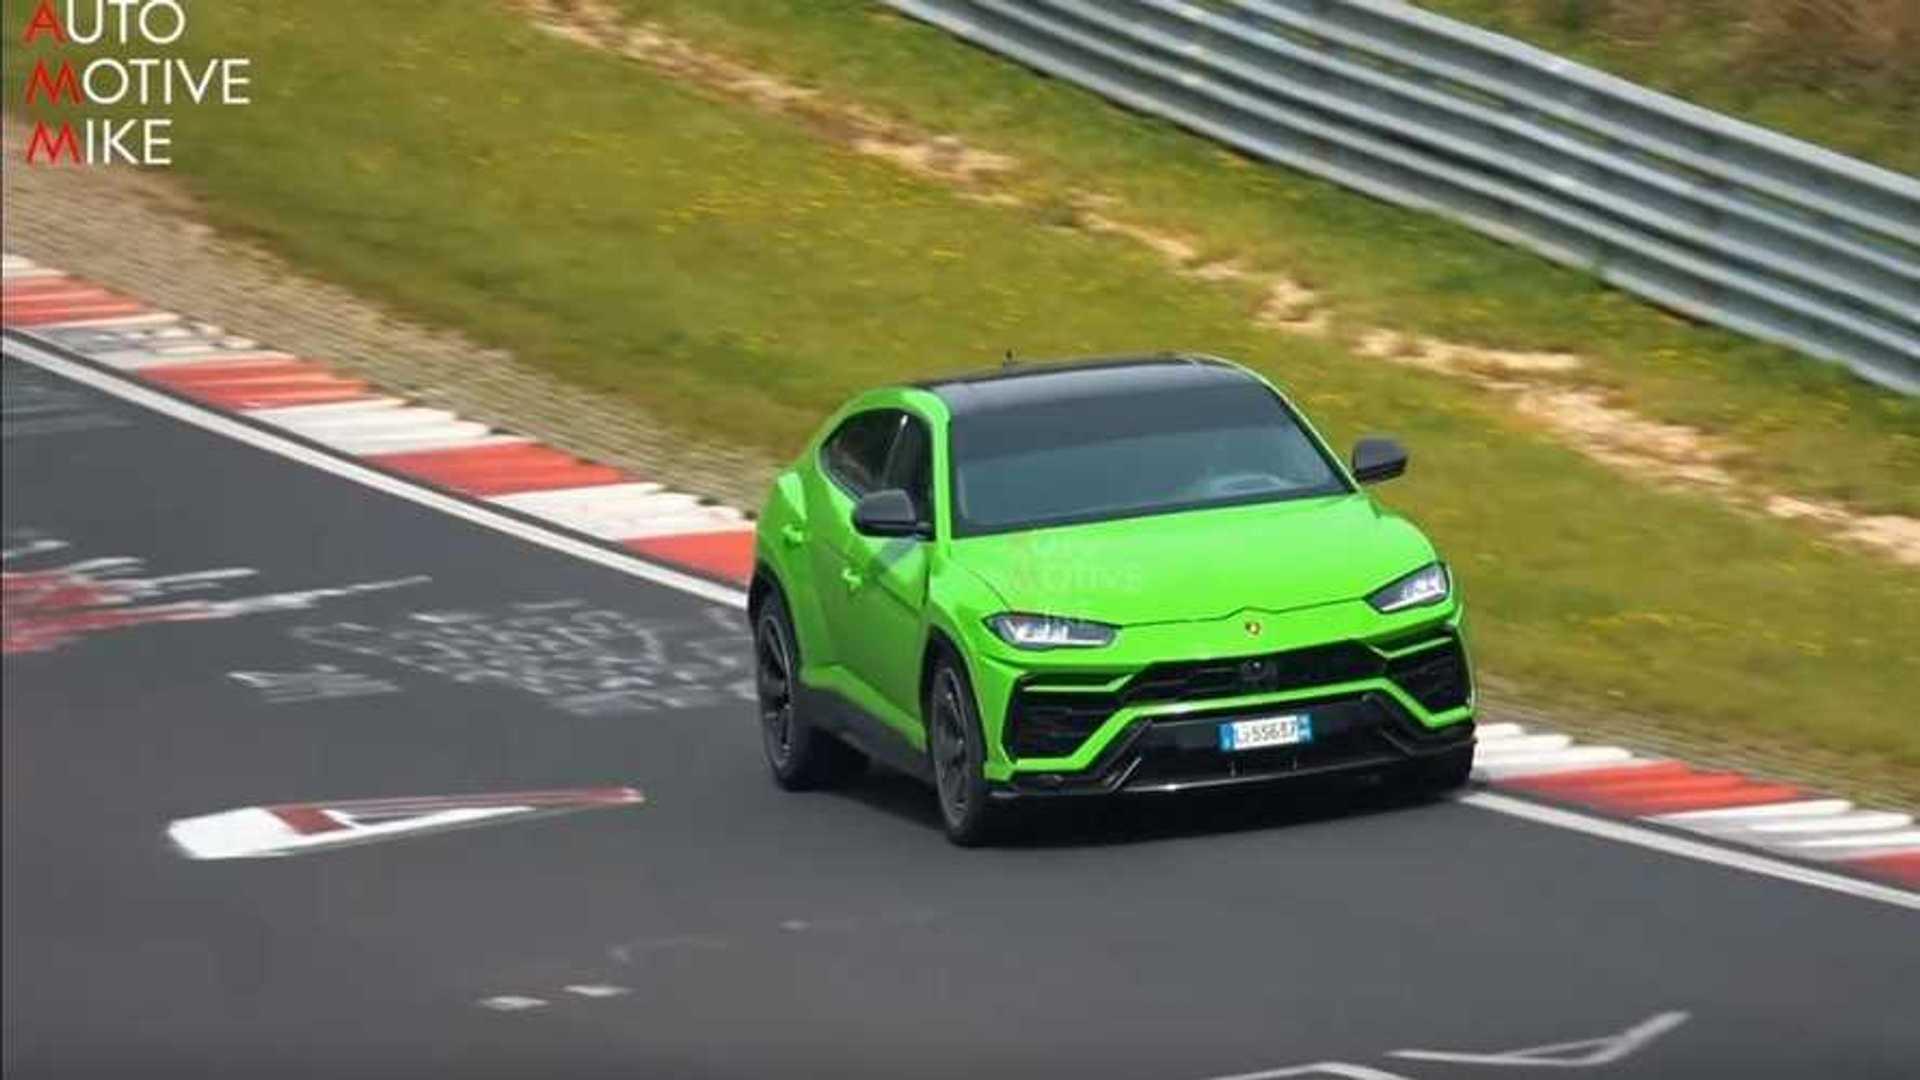 Une version plus performante du Lamborghini Urus est à venir